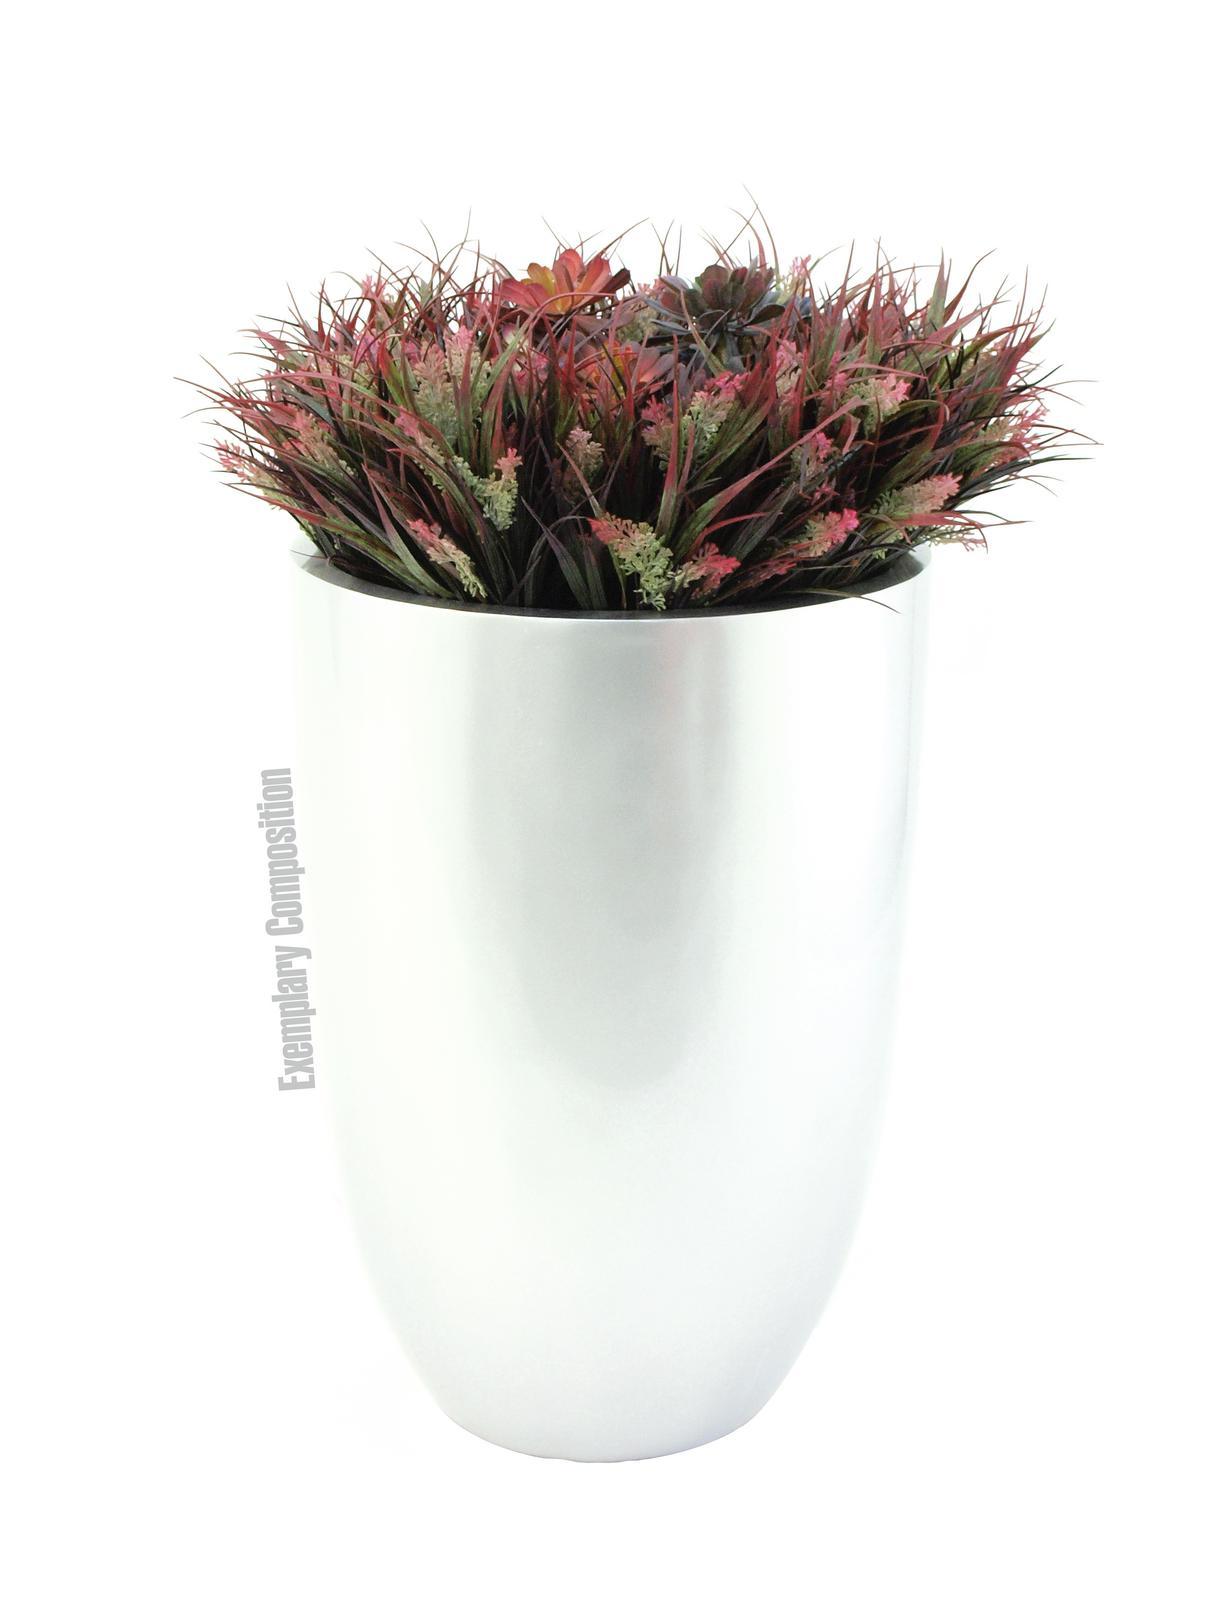 EUROPALMS LEICHTSIN CUP-49, lucido-bianco